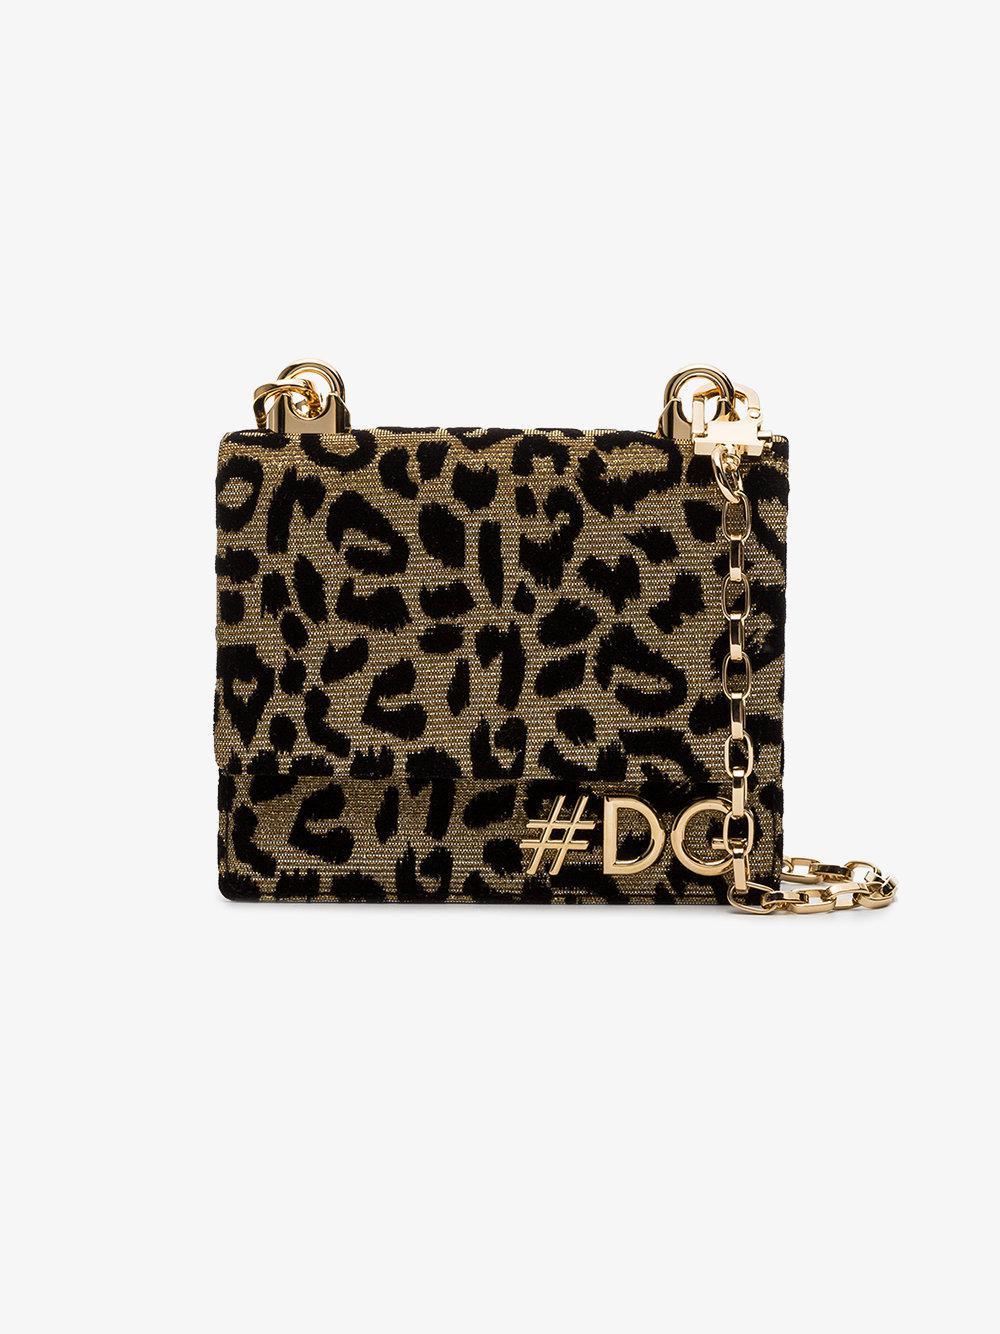 903cc5b39668 Dolce   Gabbana Dg Girls Shoulder Bag in Black - Lyst